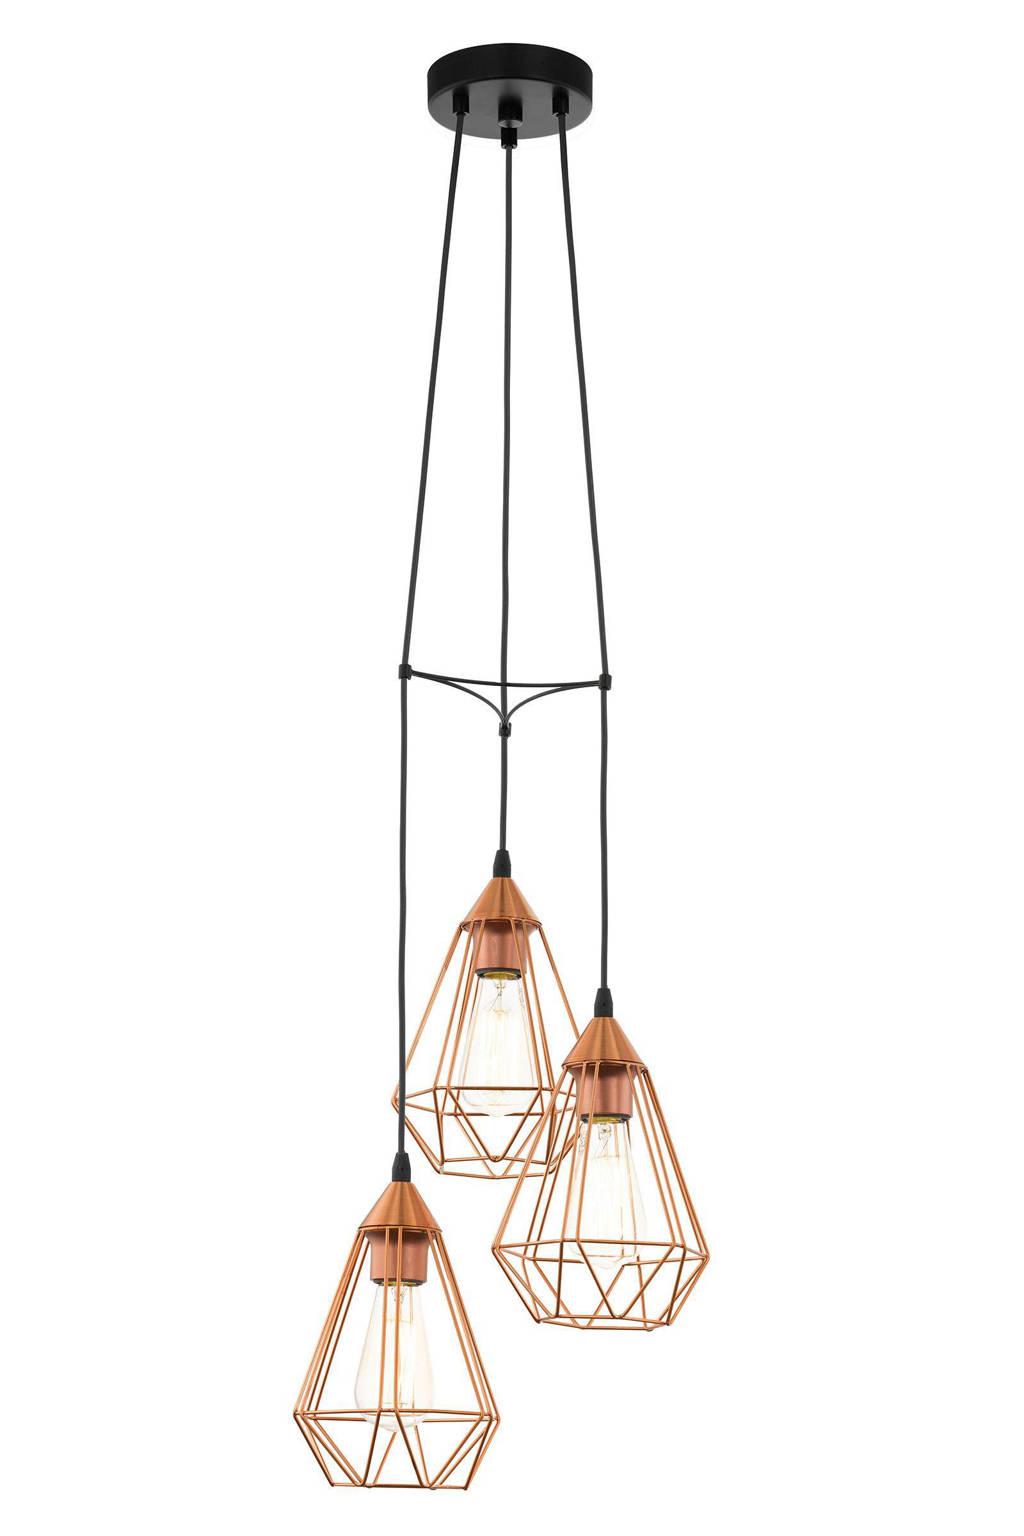 EGLO hanglamp Tarbes, Zwart/koper